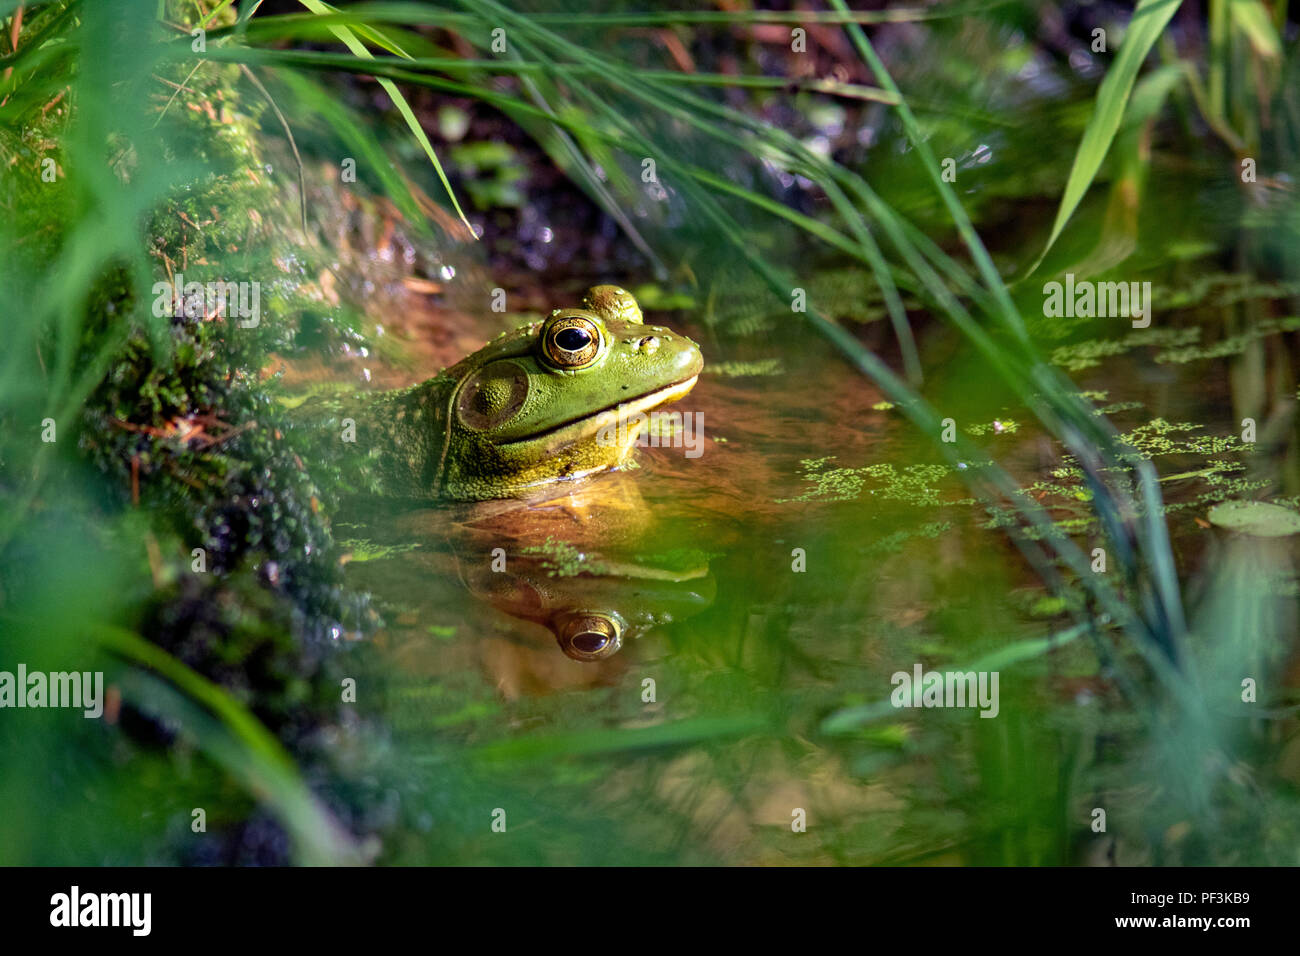 American Bullfrog (Lithobates catesbeianus) - Indian Point Trail - Garden of the Gods, Shawnee National Forest, Illinois, USA - Stock Image